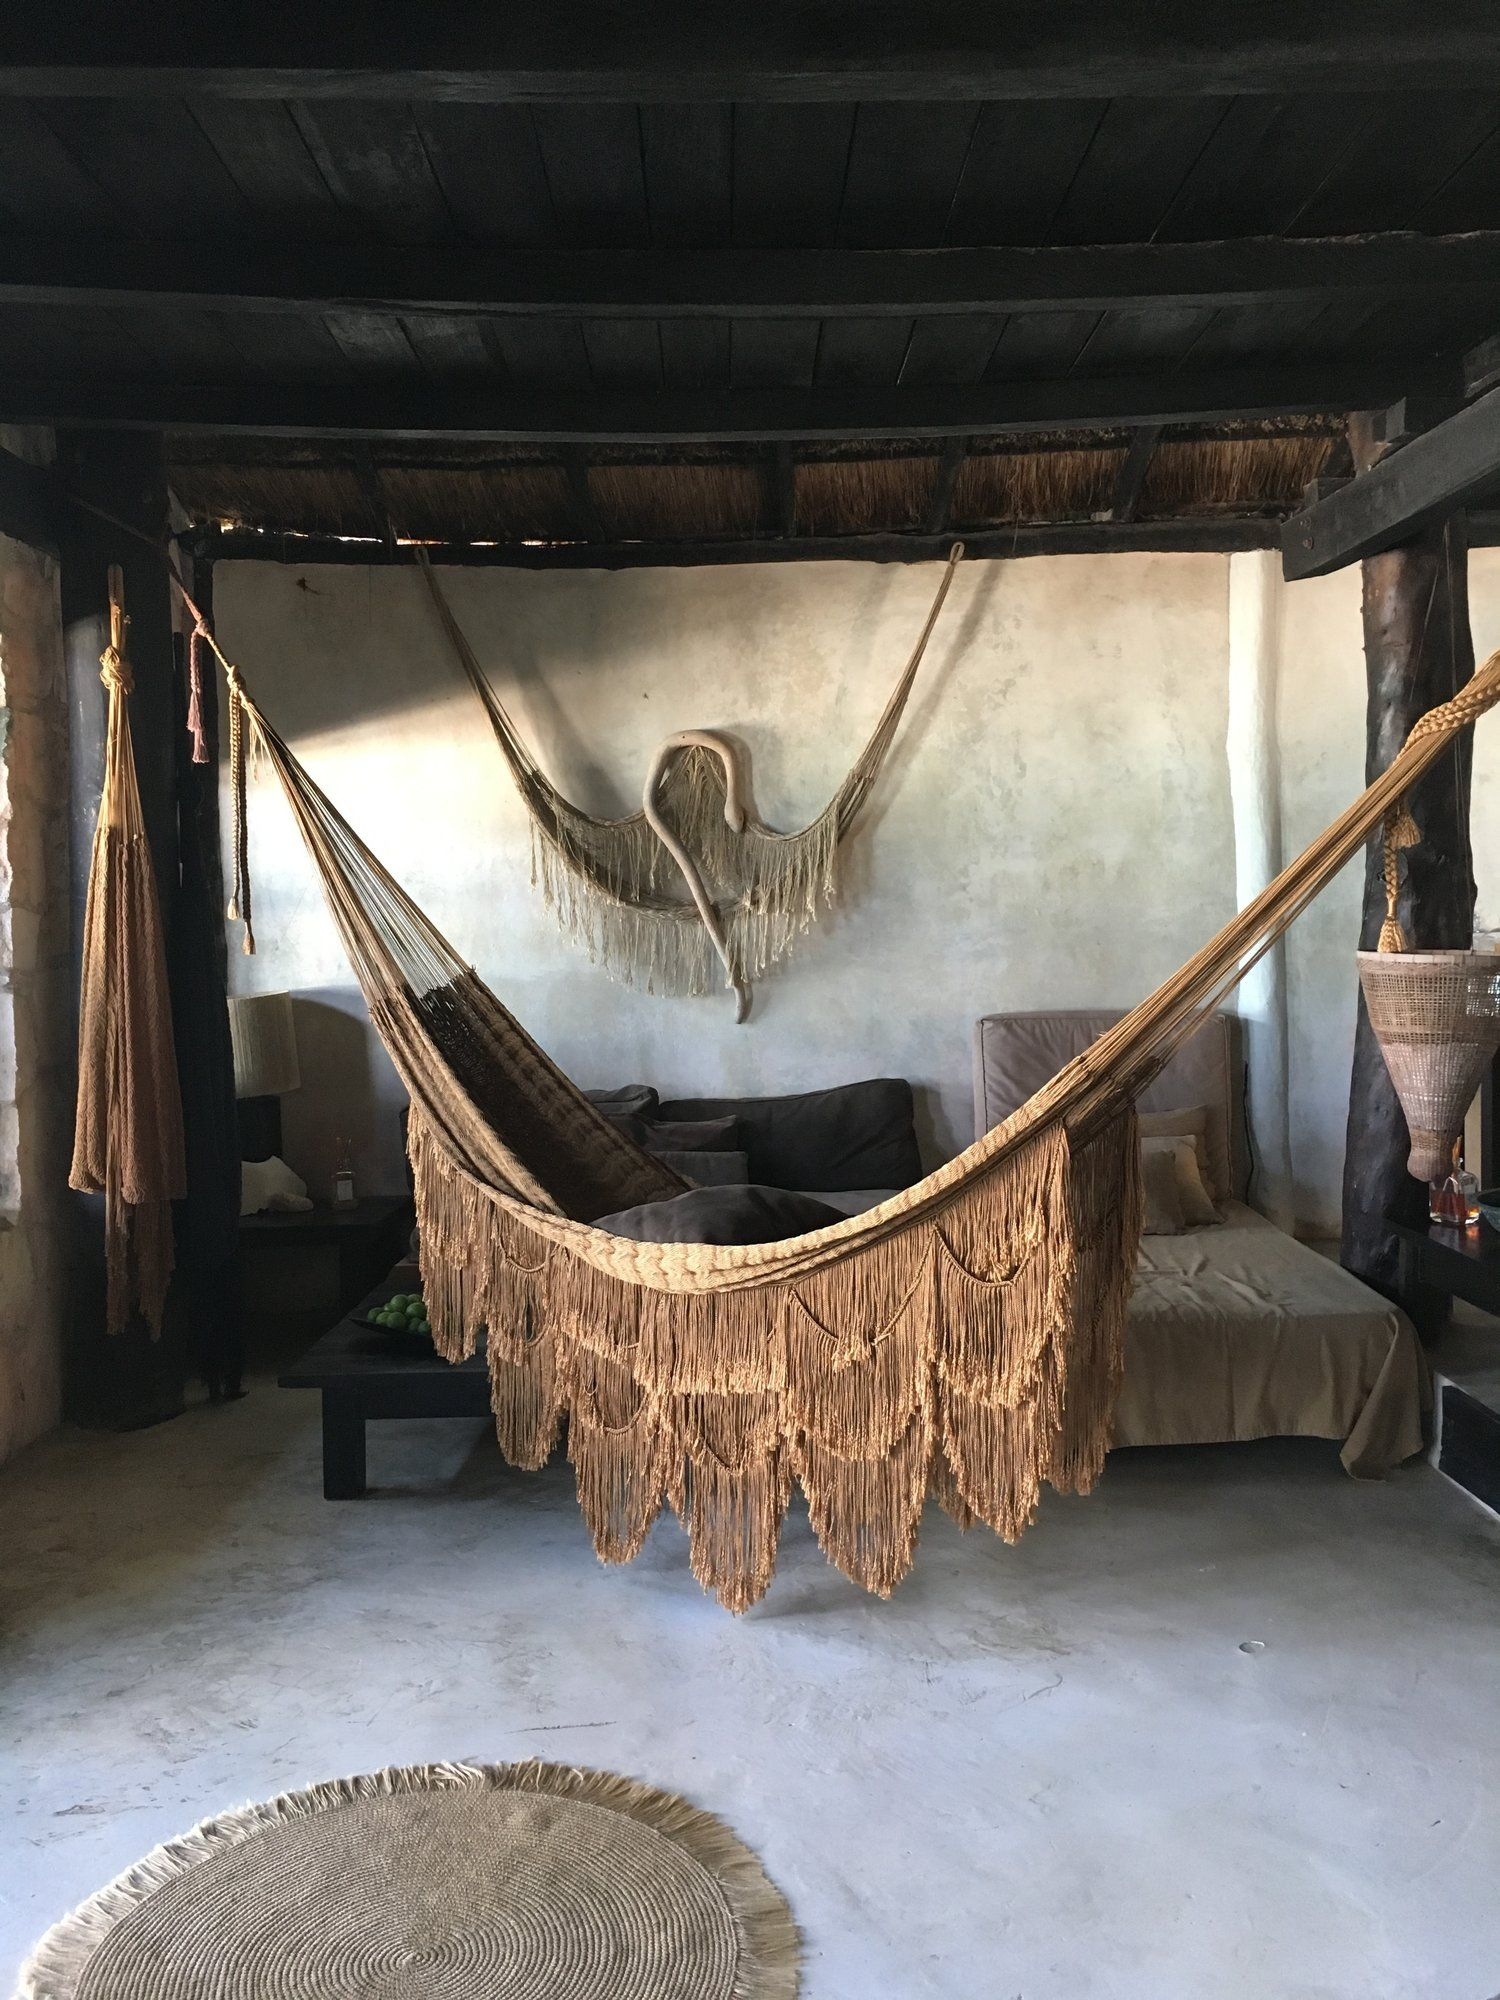 Sugar u gold tulum mexico coqui coqui gold hammock tulum